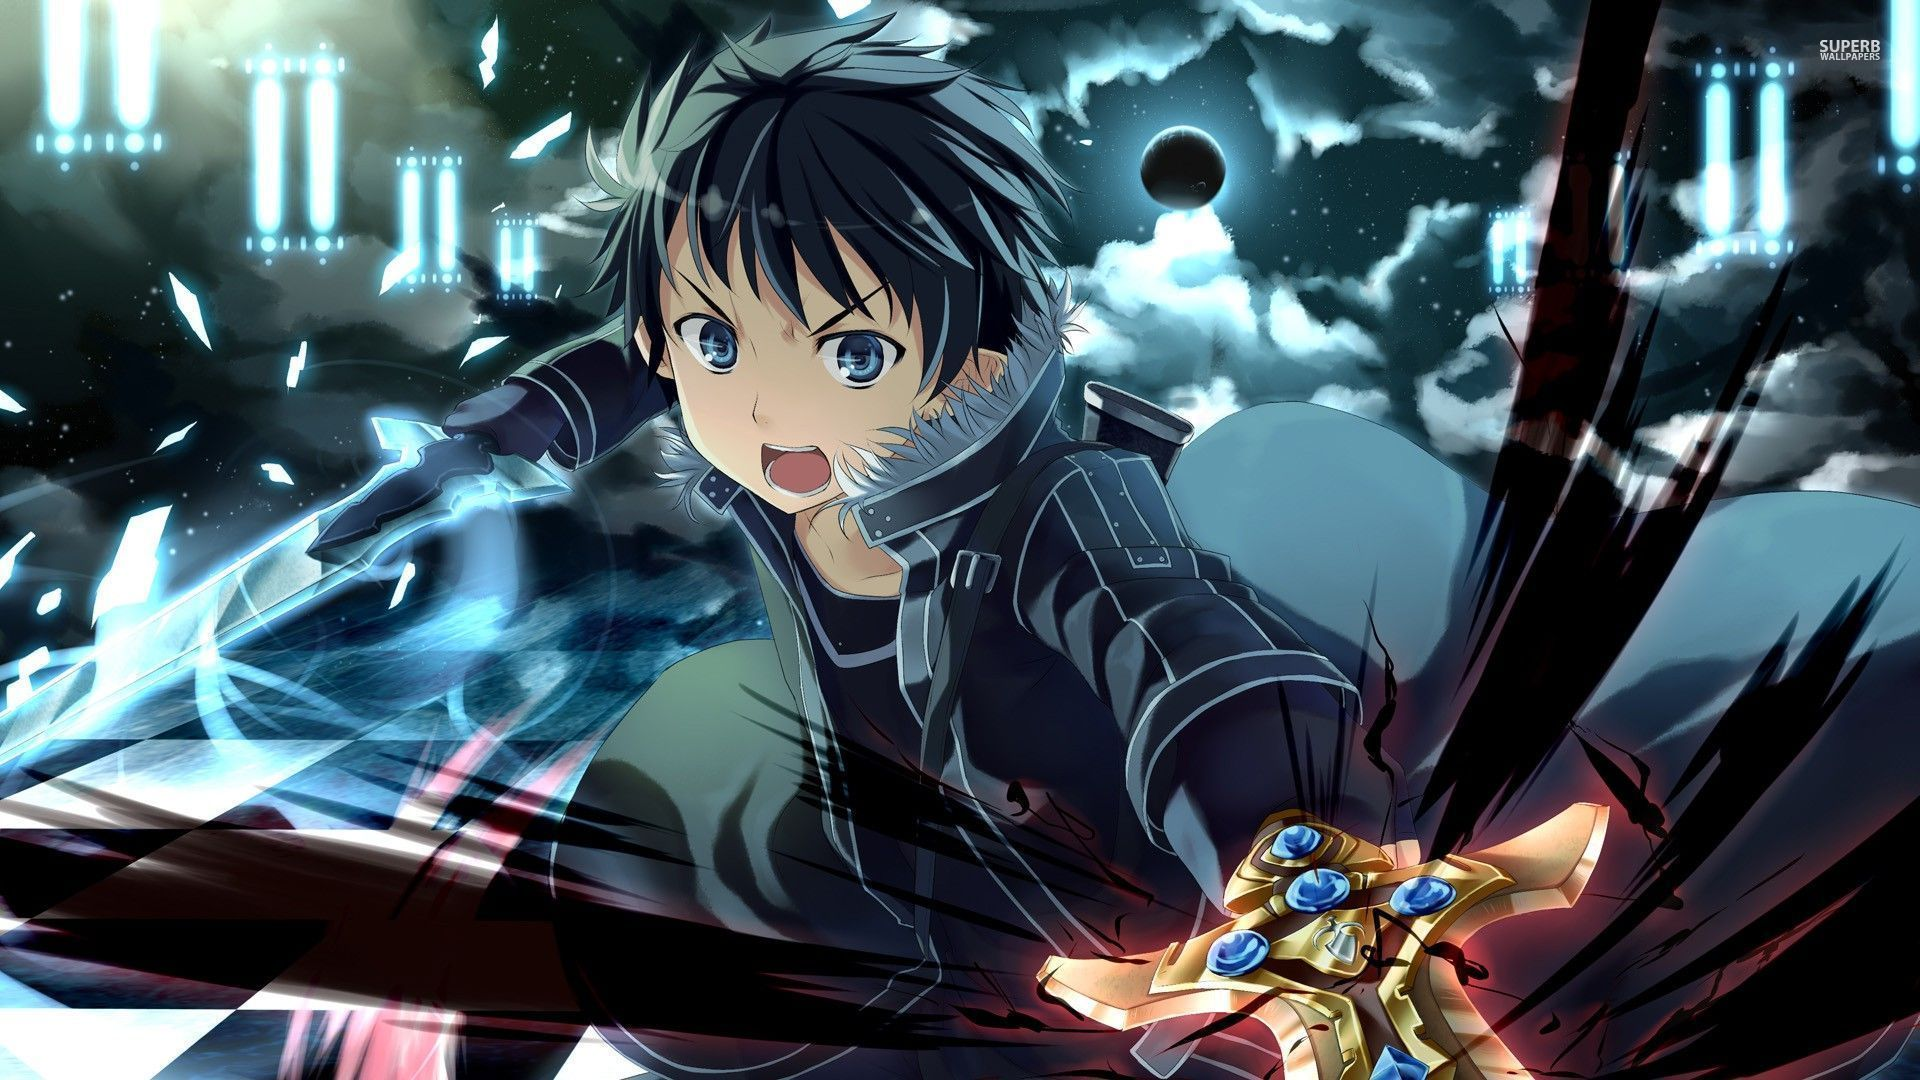 Sword Art Online 4k Wallpaper Posted By John Anderson